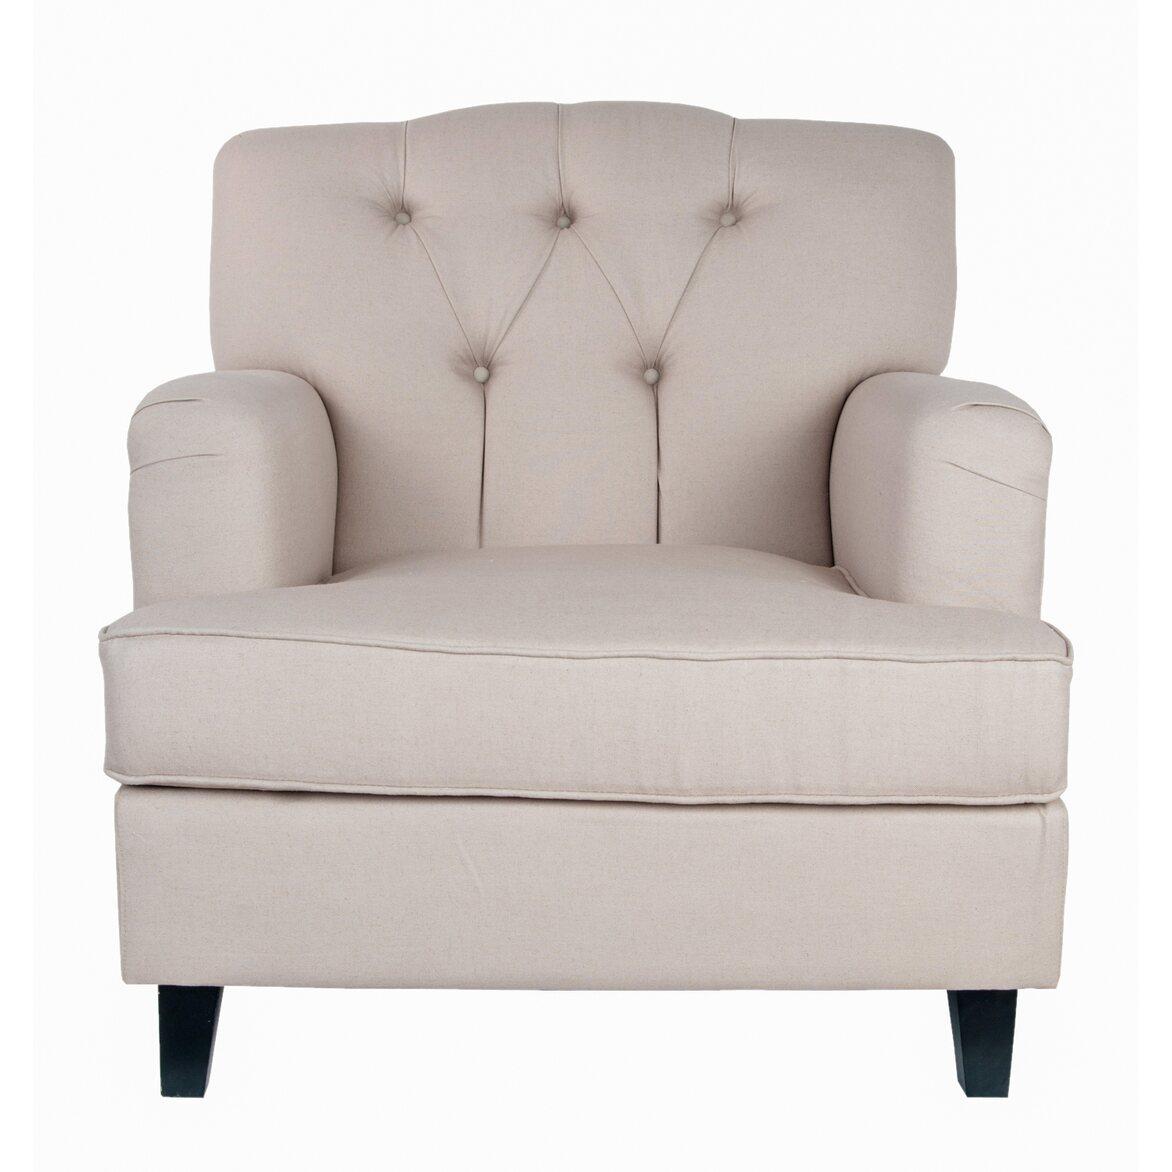 Кресло Somac beige 2   Каминные кресла Kingsby